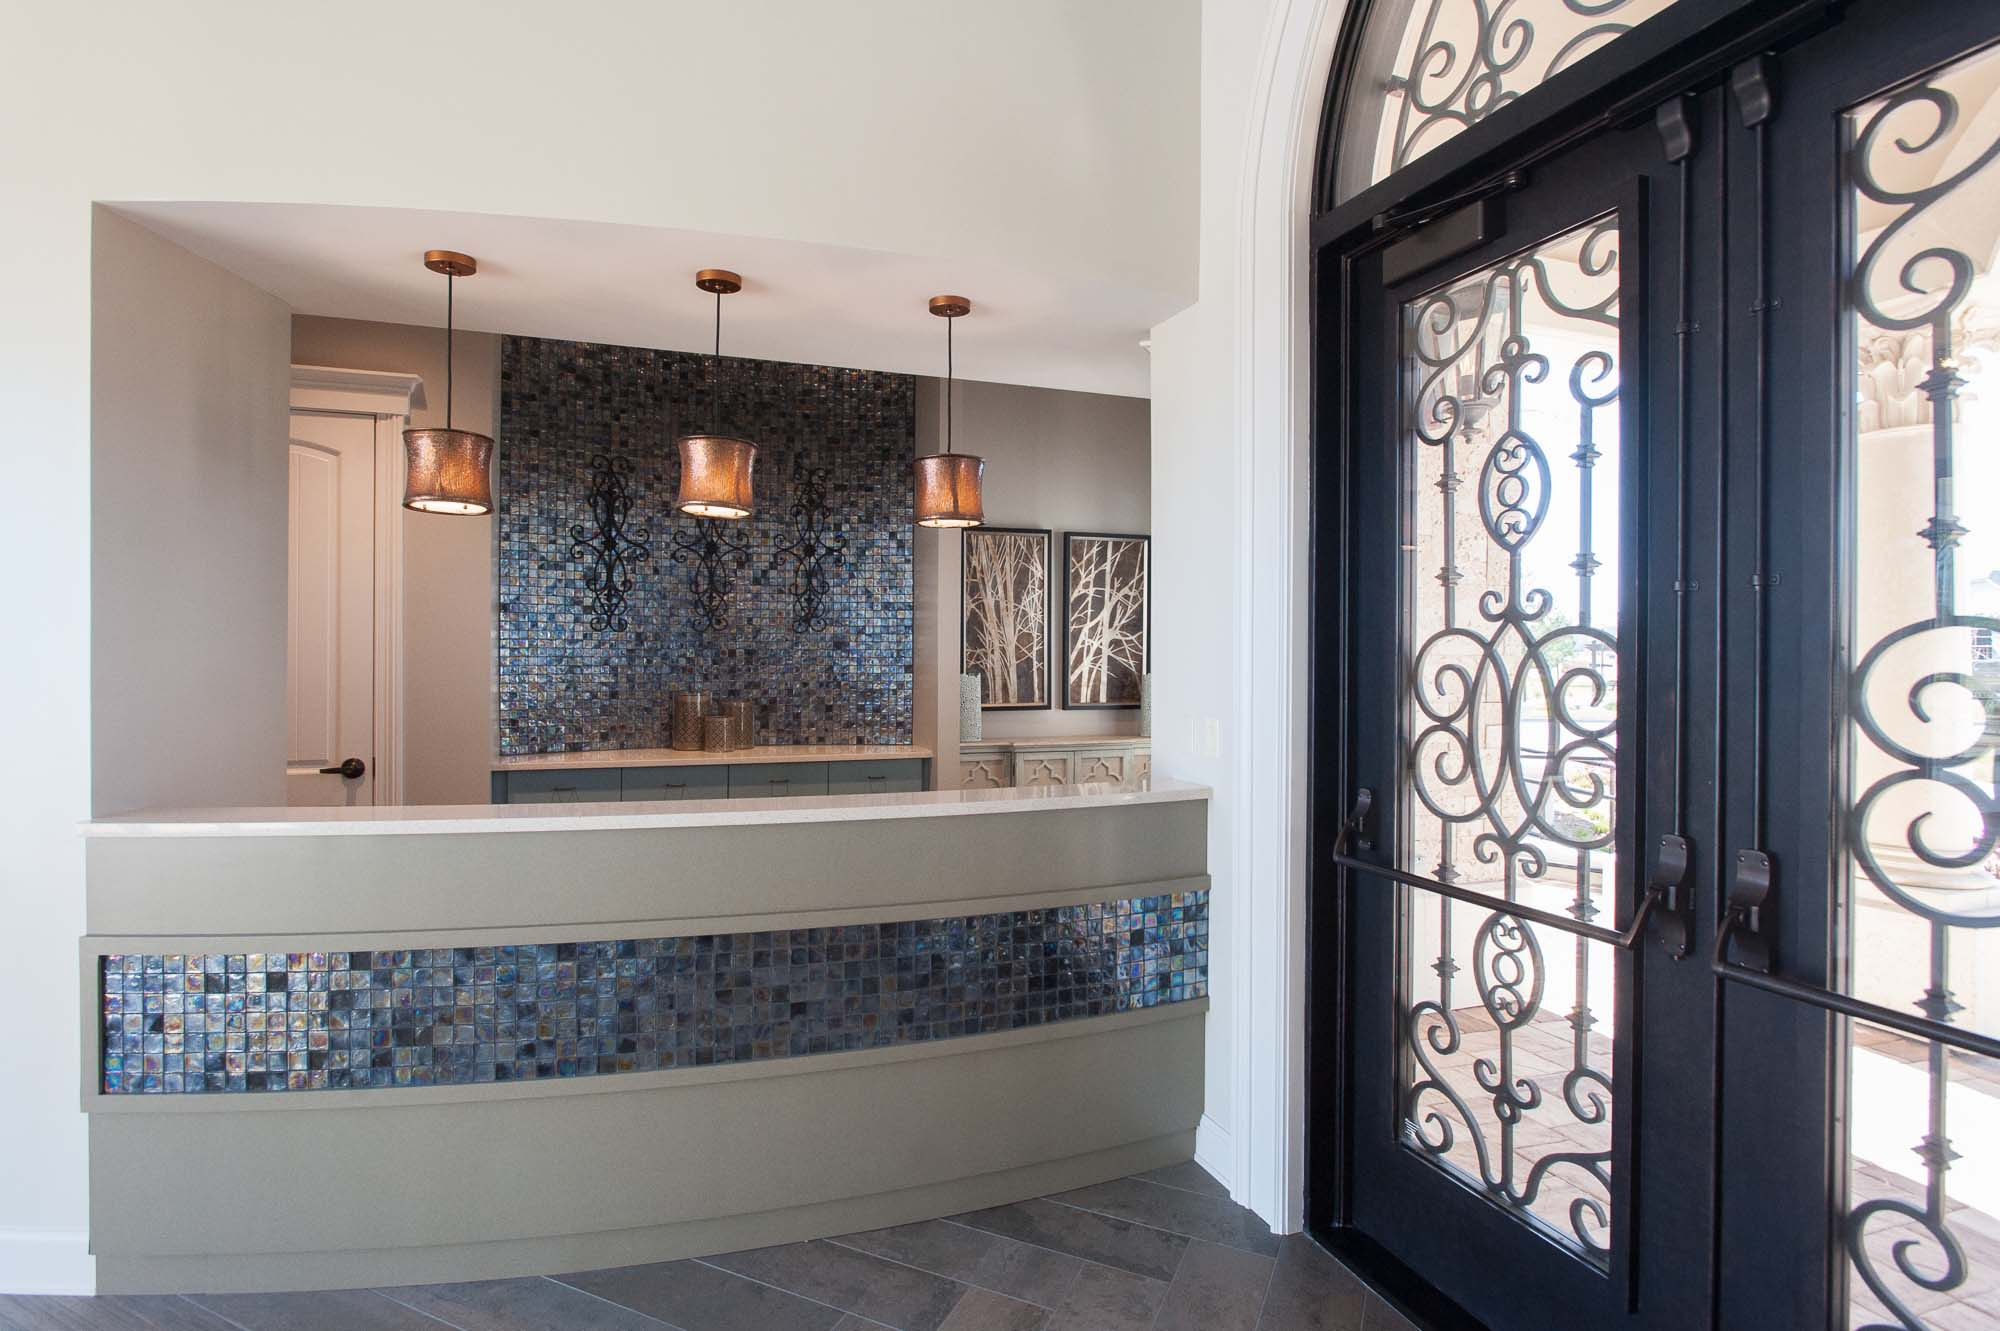 artisan lakes-lennar-ponte vedra-florida-nefba-northeast florida-southeastern united states-commercial interior design-entry-welcome desk-blue glass tile.jpg